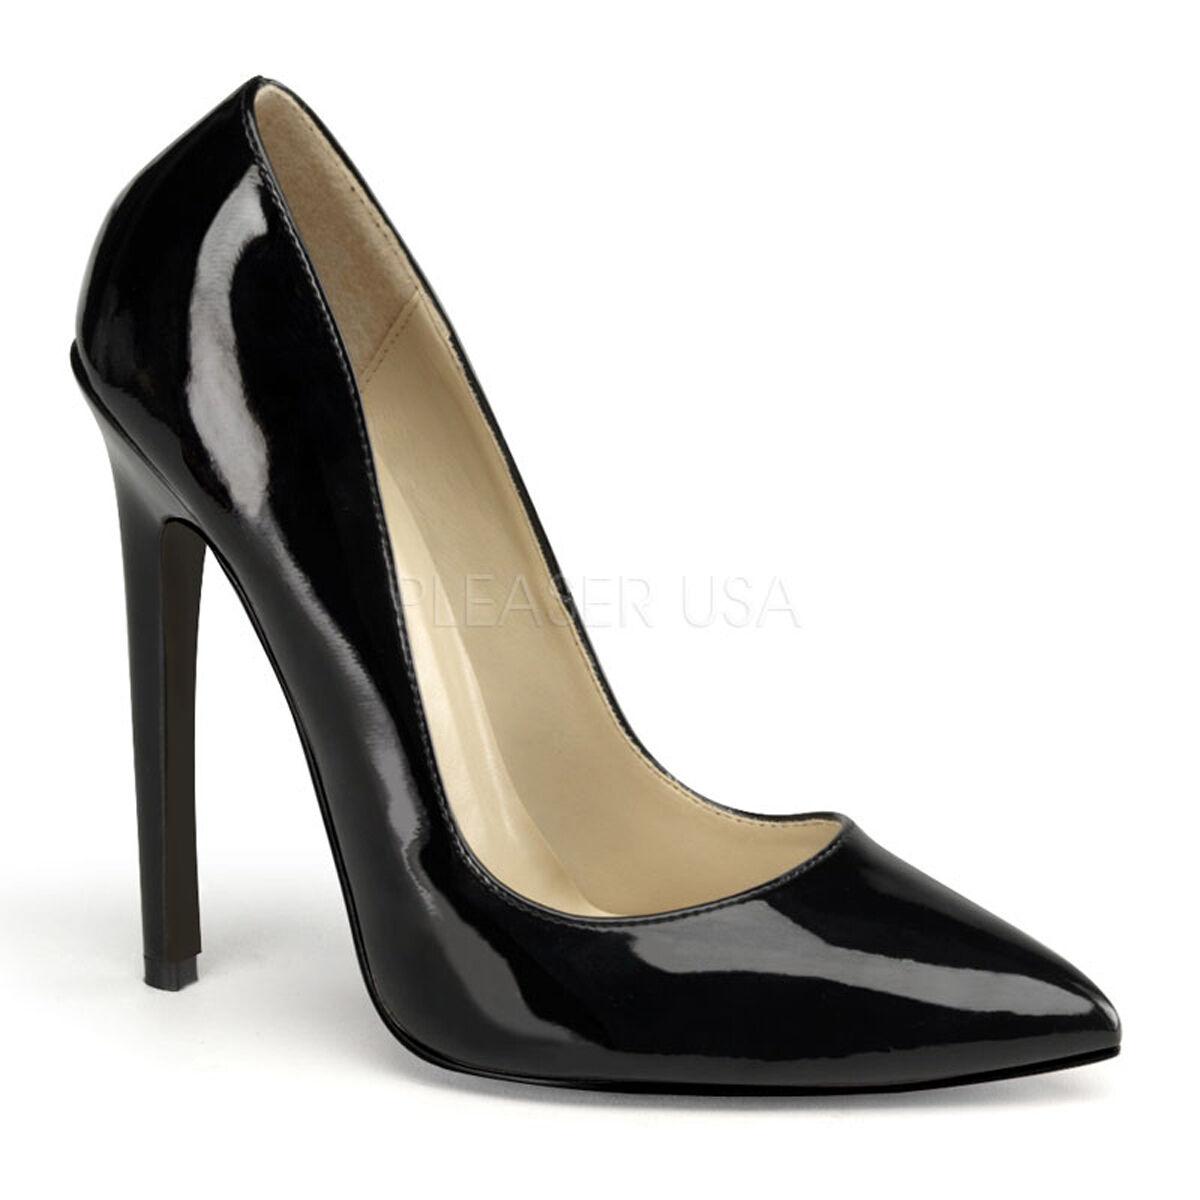 PLEASER SEXY-20 BLACK PATENT  POINTED TOE STILETTO HIGH HEEL COURT Schuhe